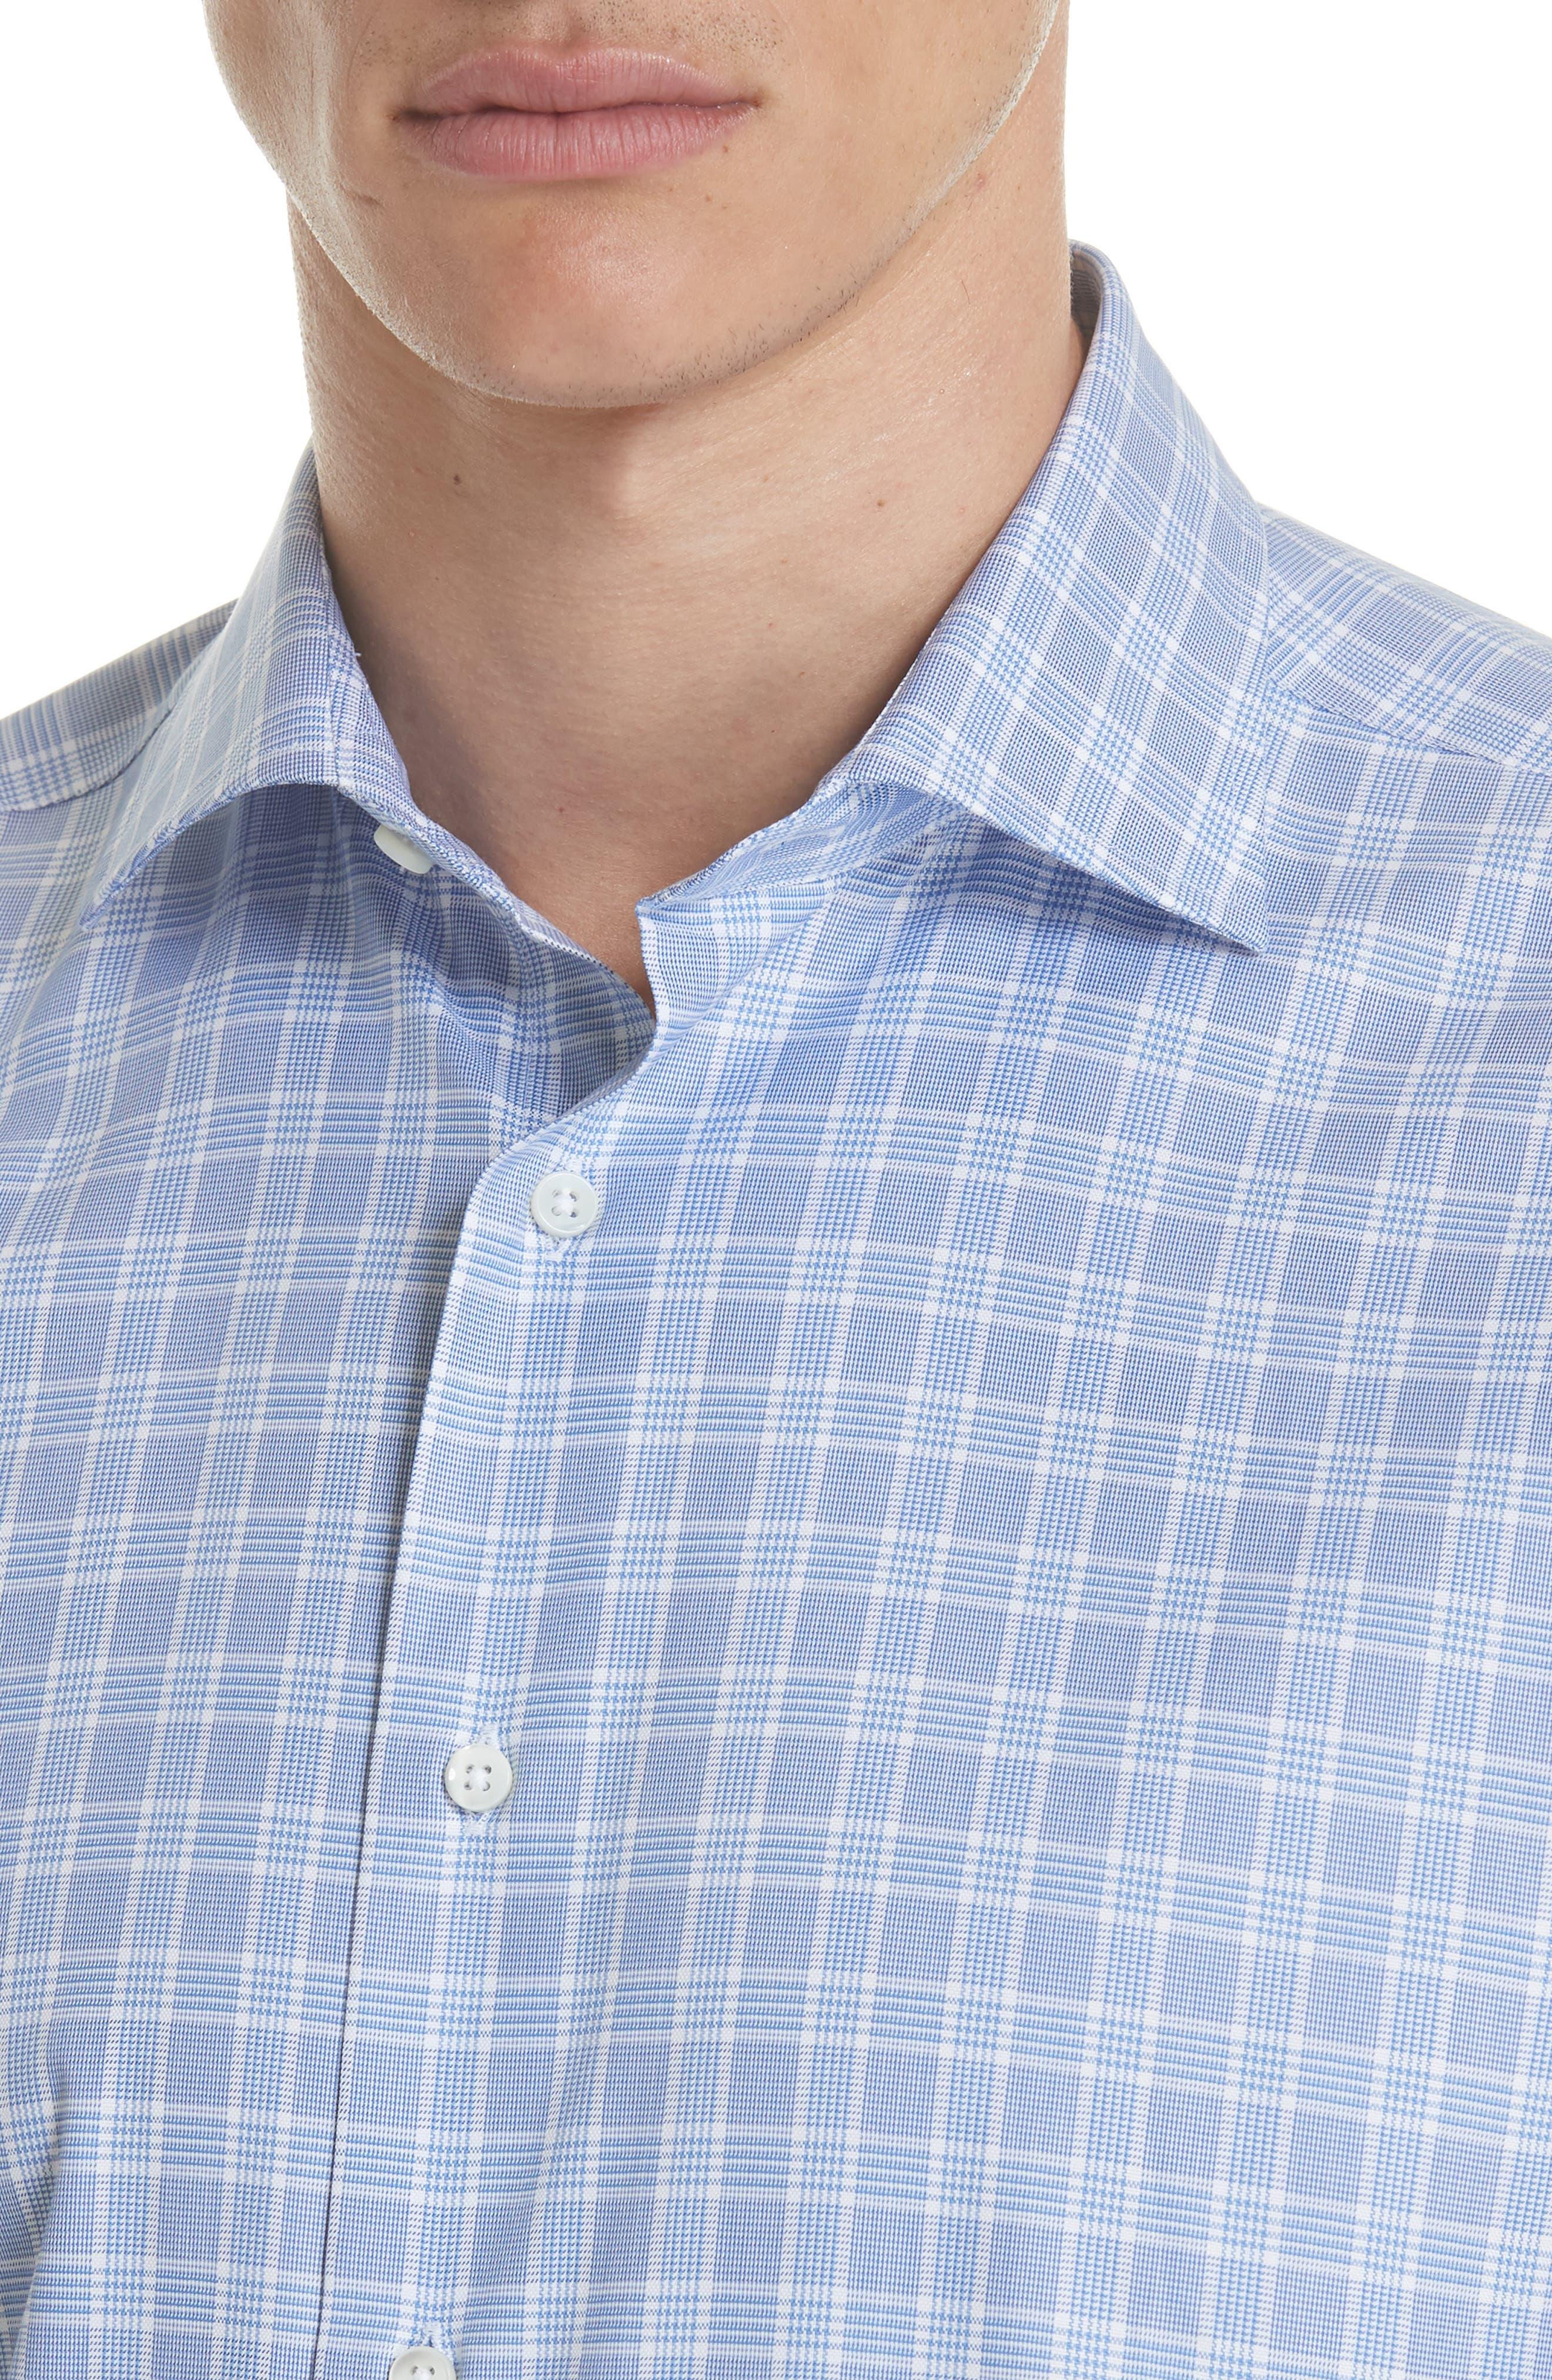 Regular Fit Check Dress Shirt,                             Alternate thumbnail 2, color,